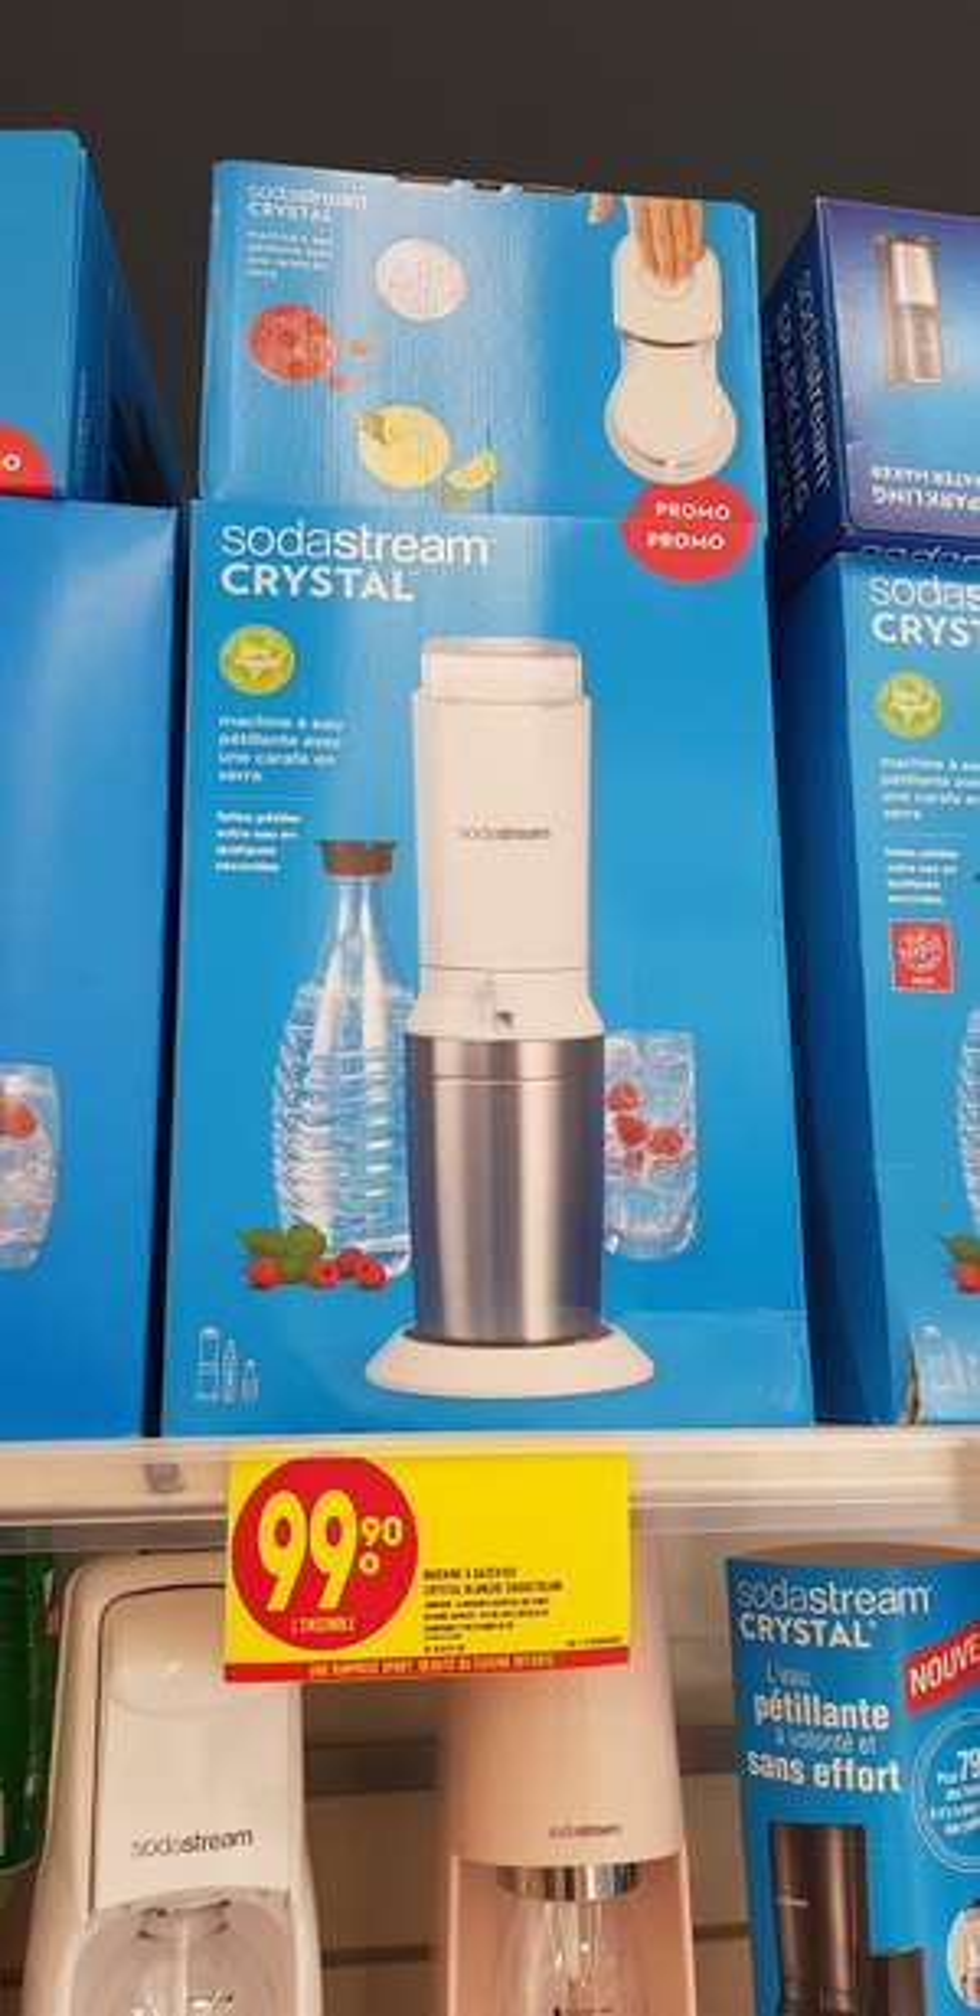 Machine à gazéifier l'eau SodaStream Crystal - Odysseum Montpellier (34)